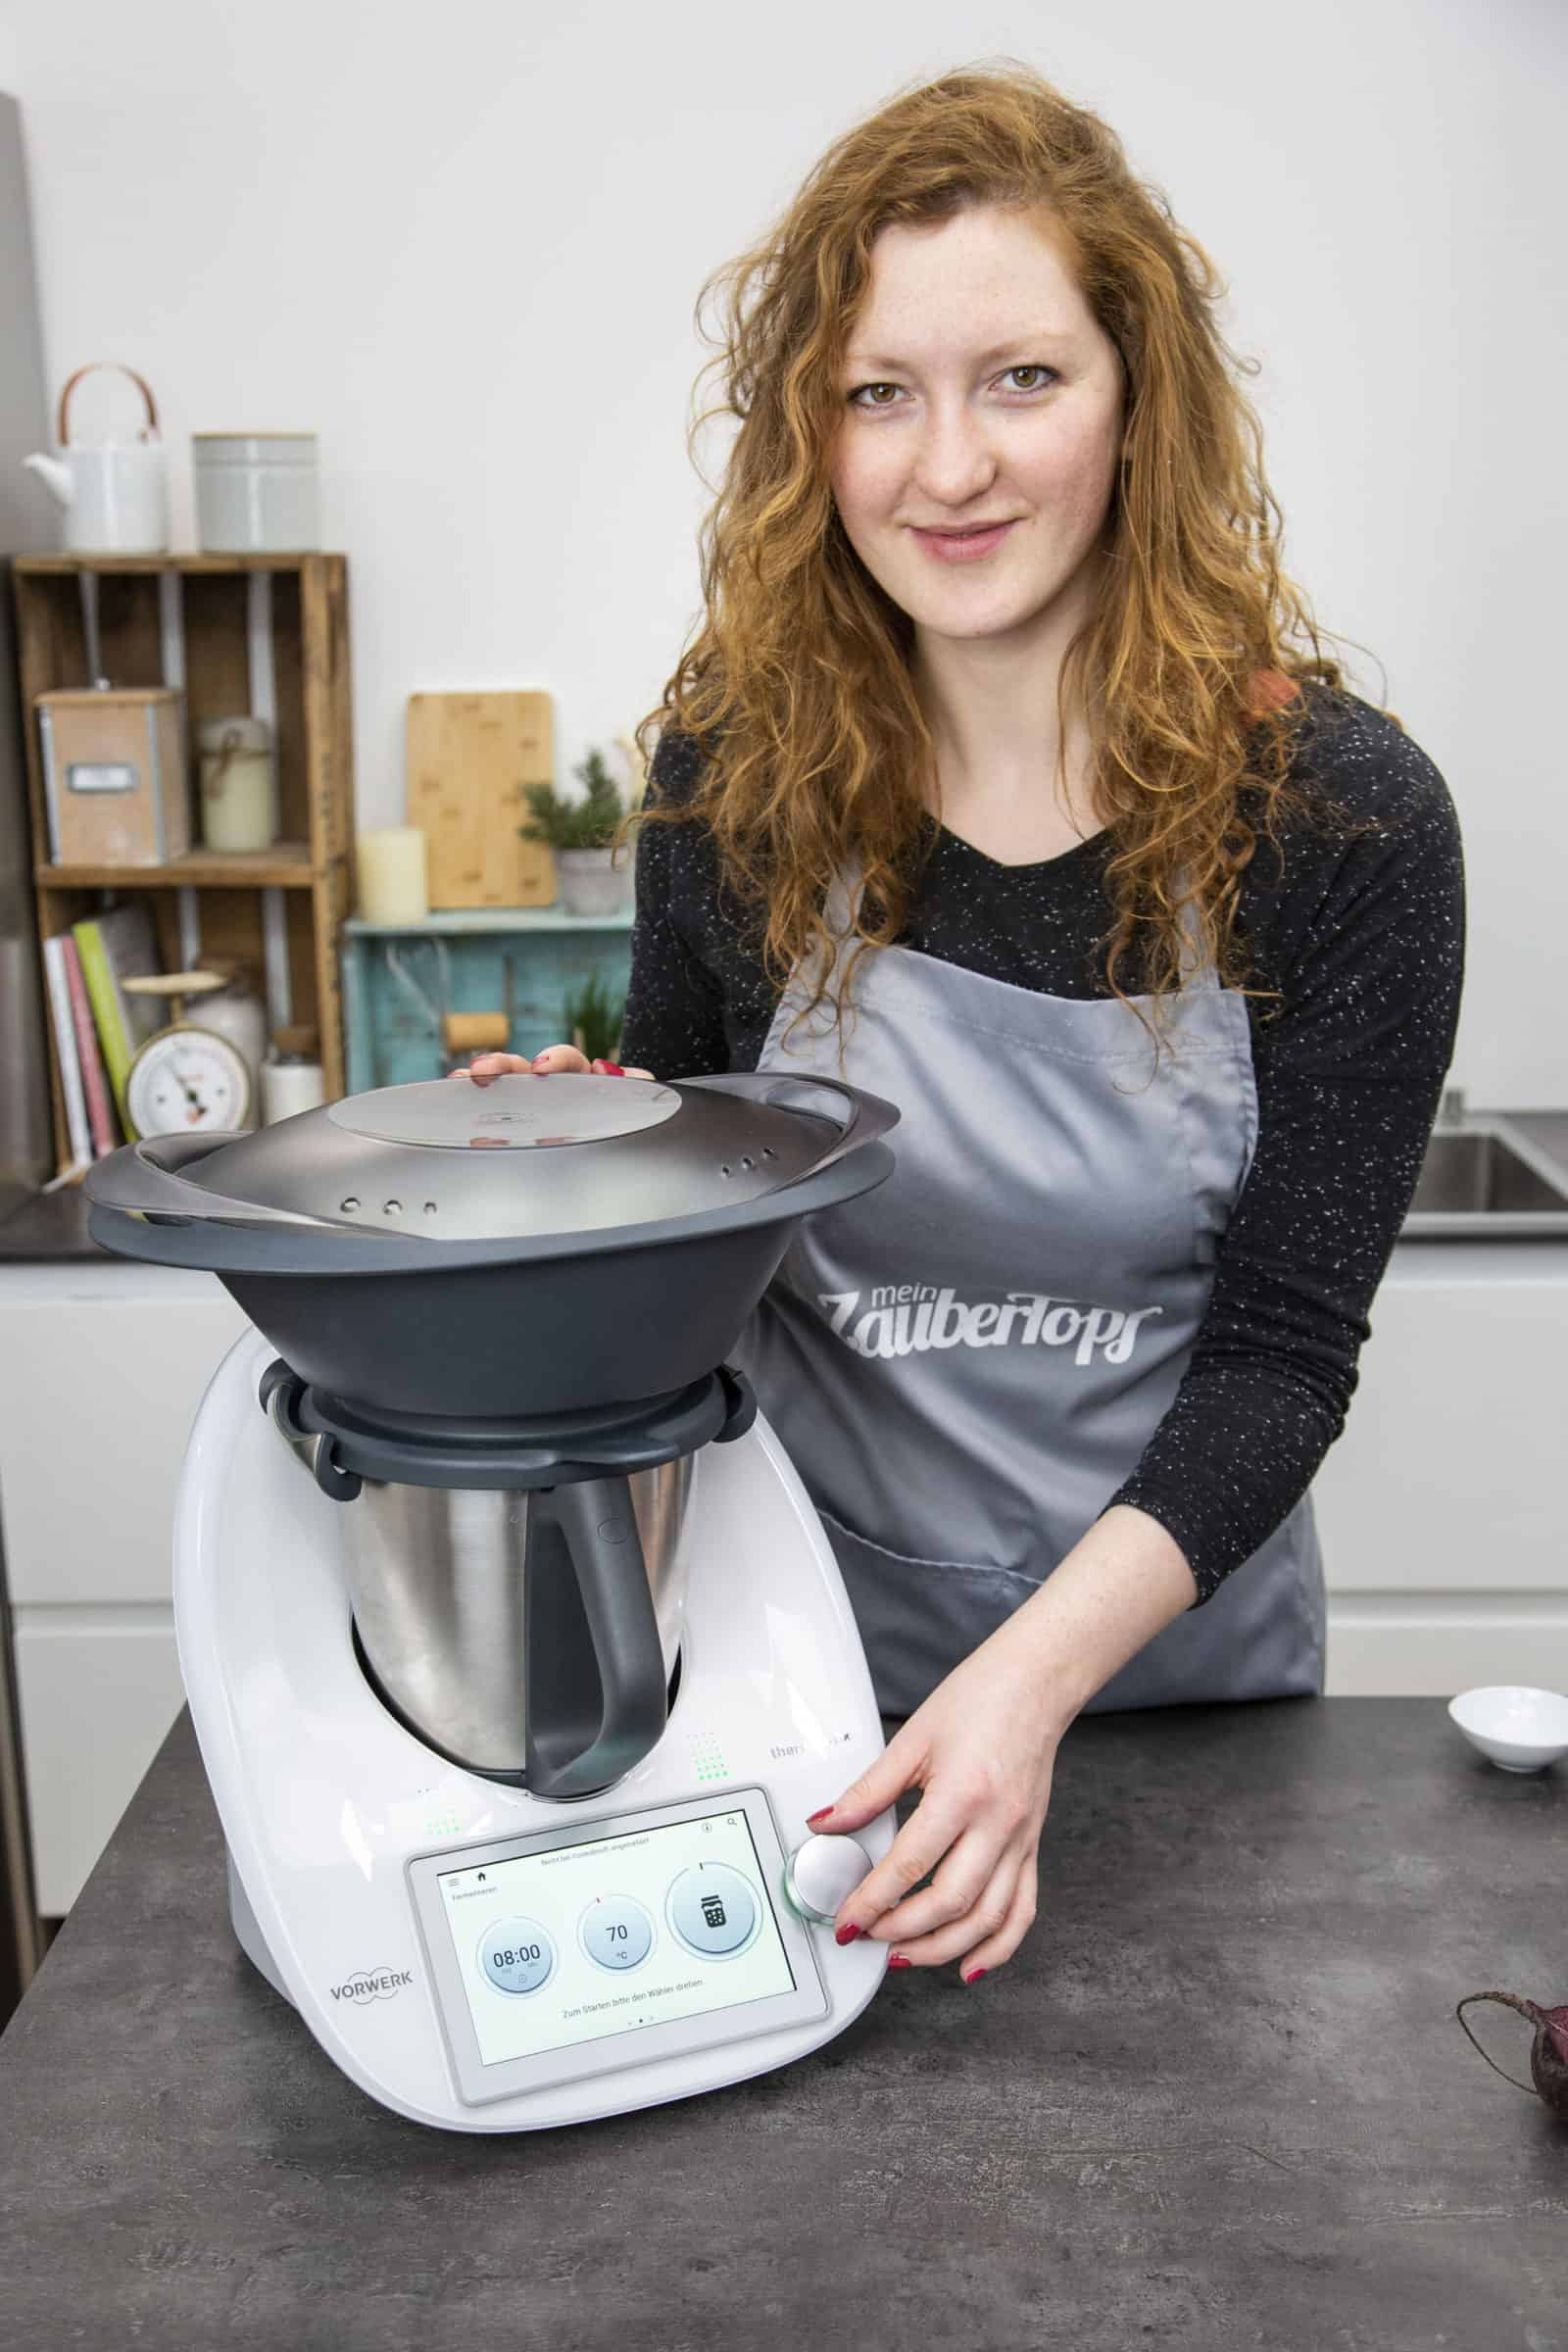 Naturjoghurt selbst herstellen mti dem Thermomix® –Foto: Kathrin Knoll